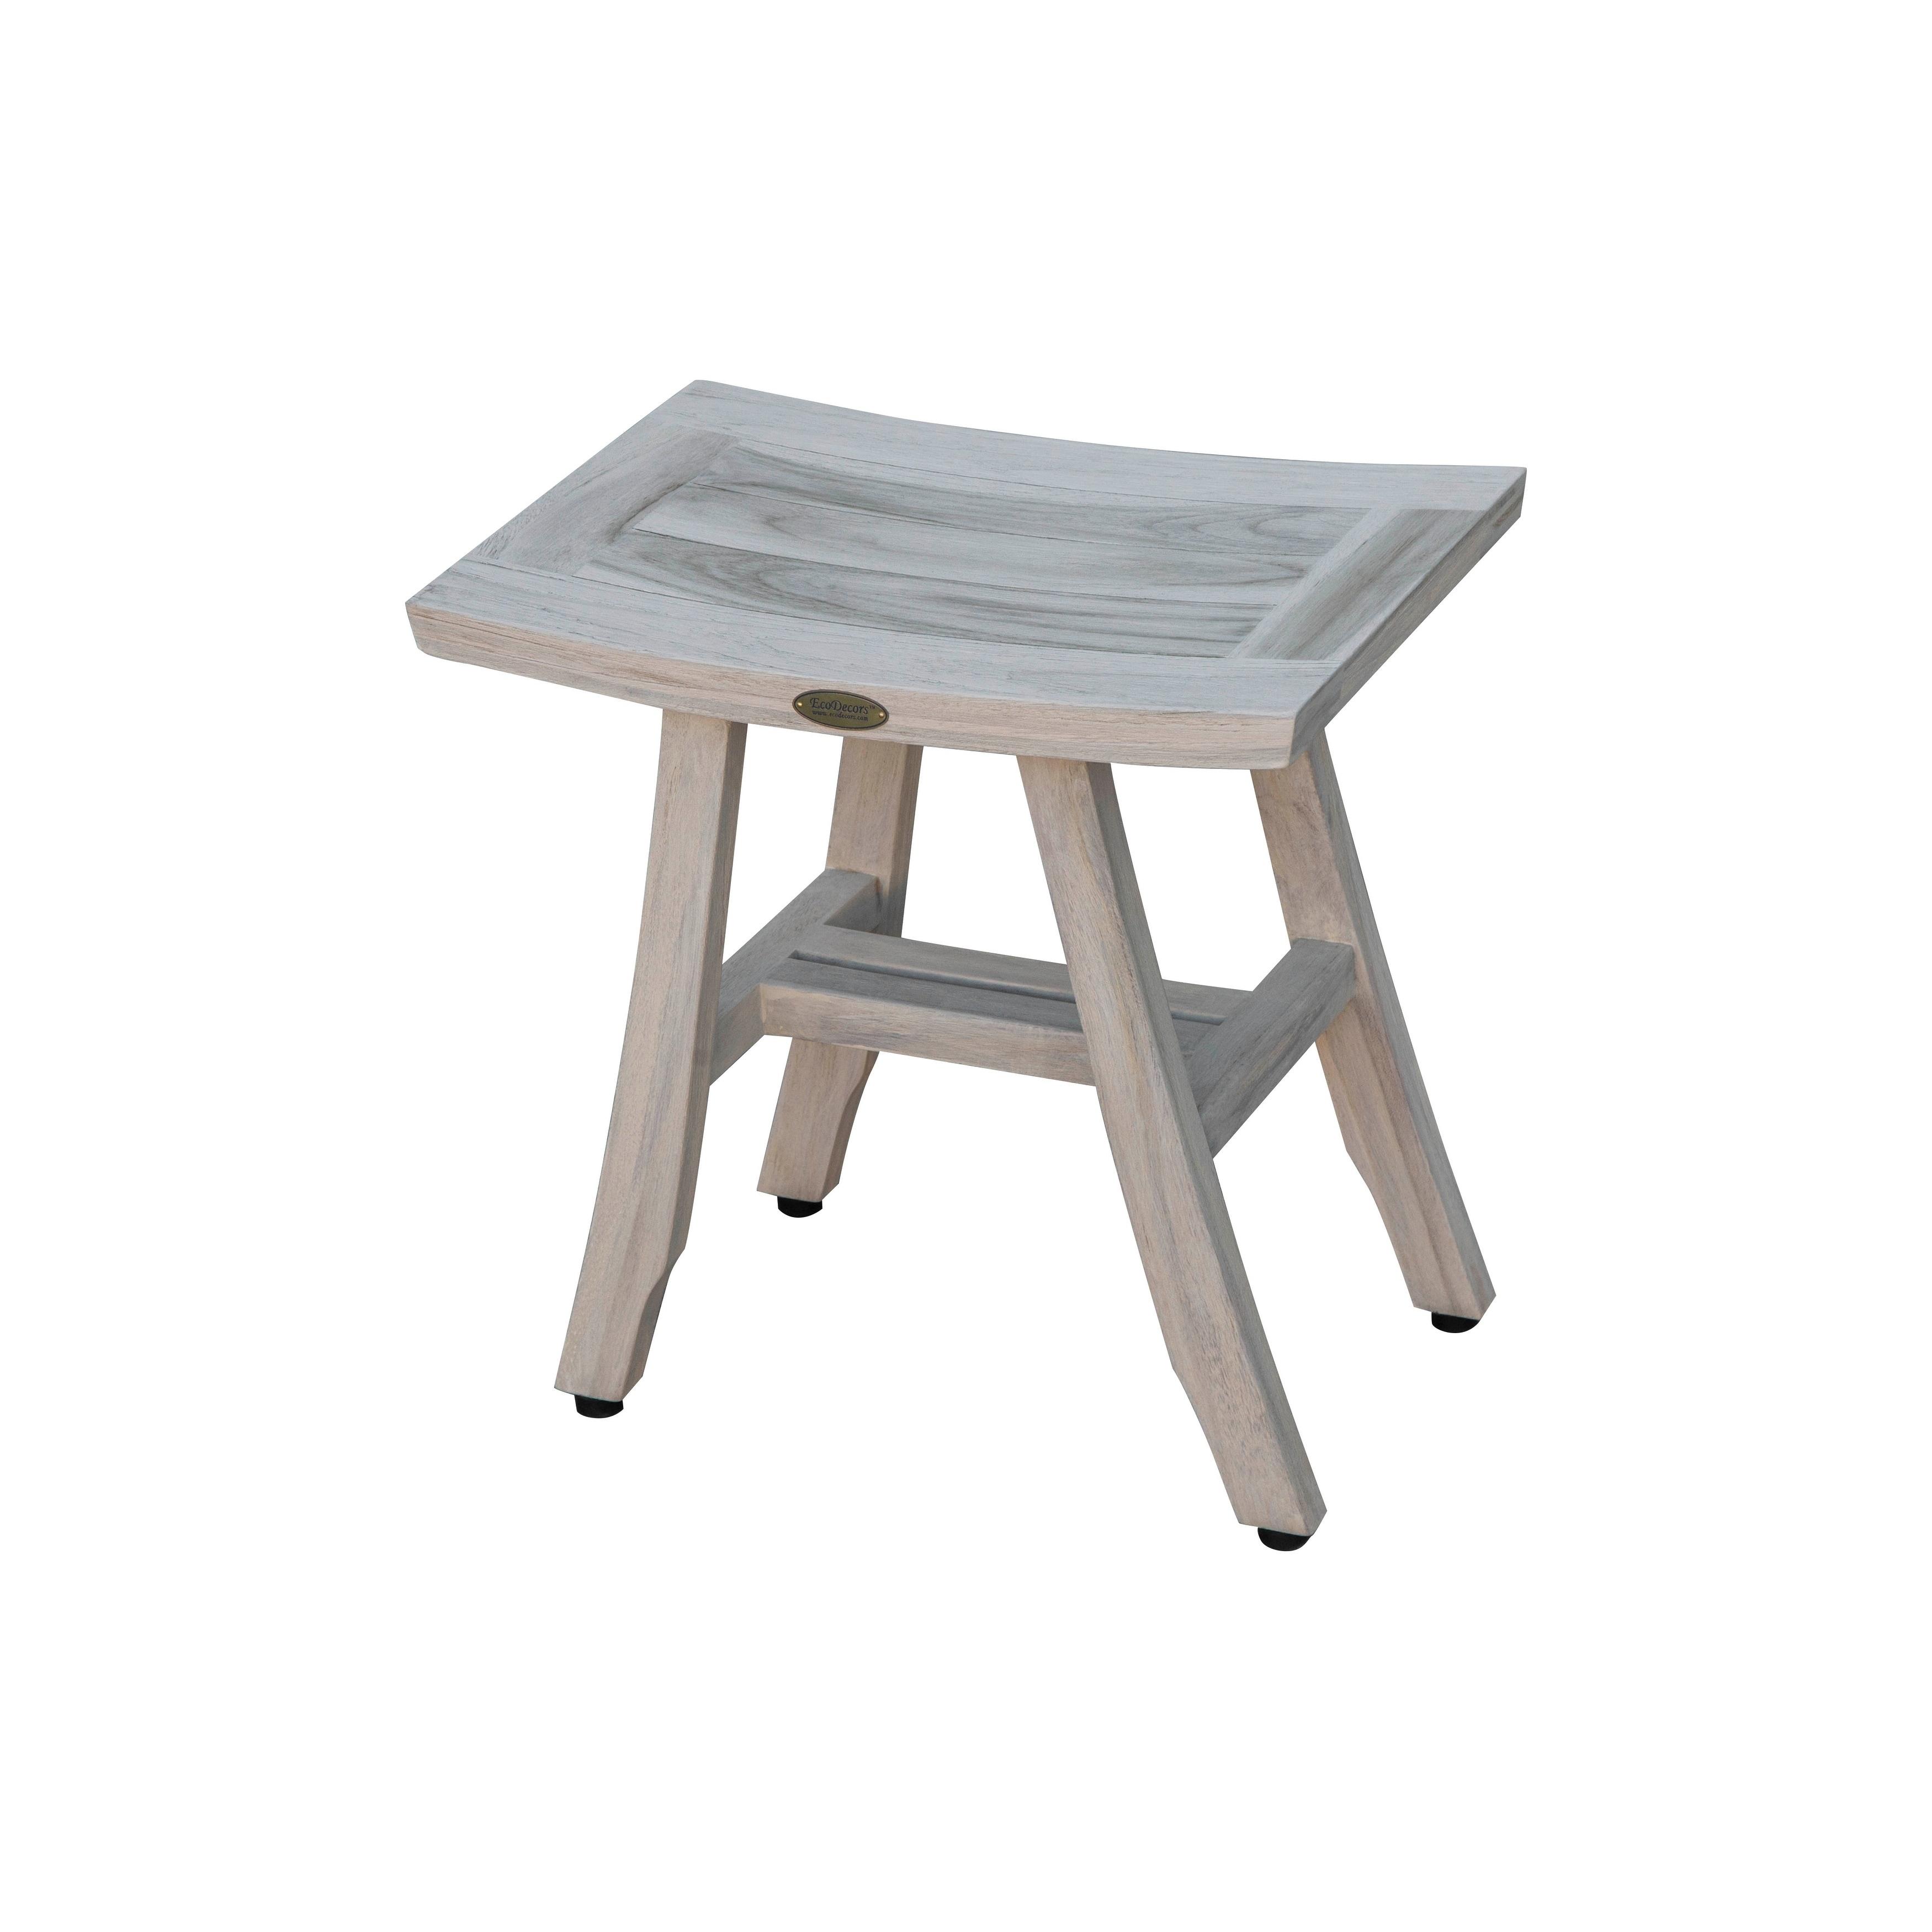 Coastalvogue Satori 18 Teak Shower Bathroom Stool Coastal Driftwood Finish Overstock 28301106